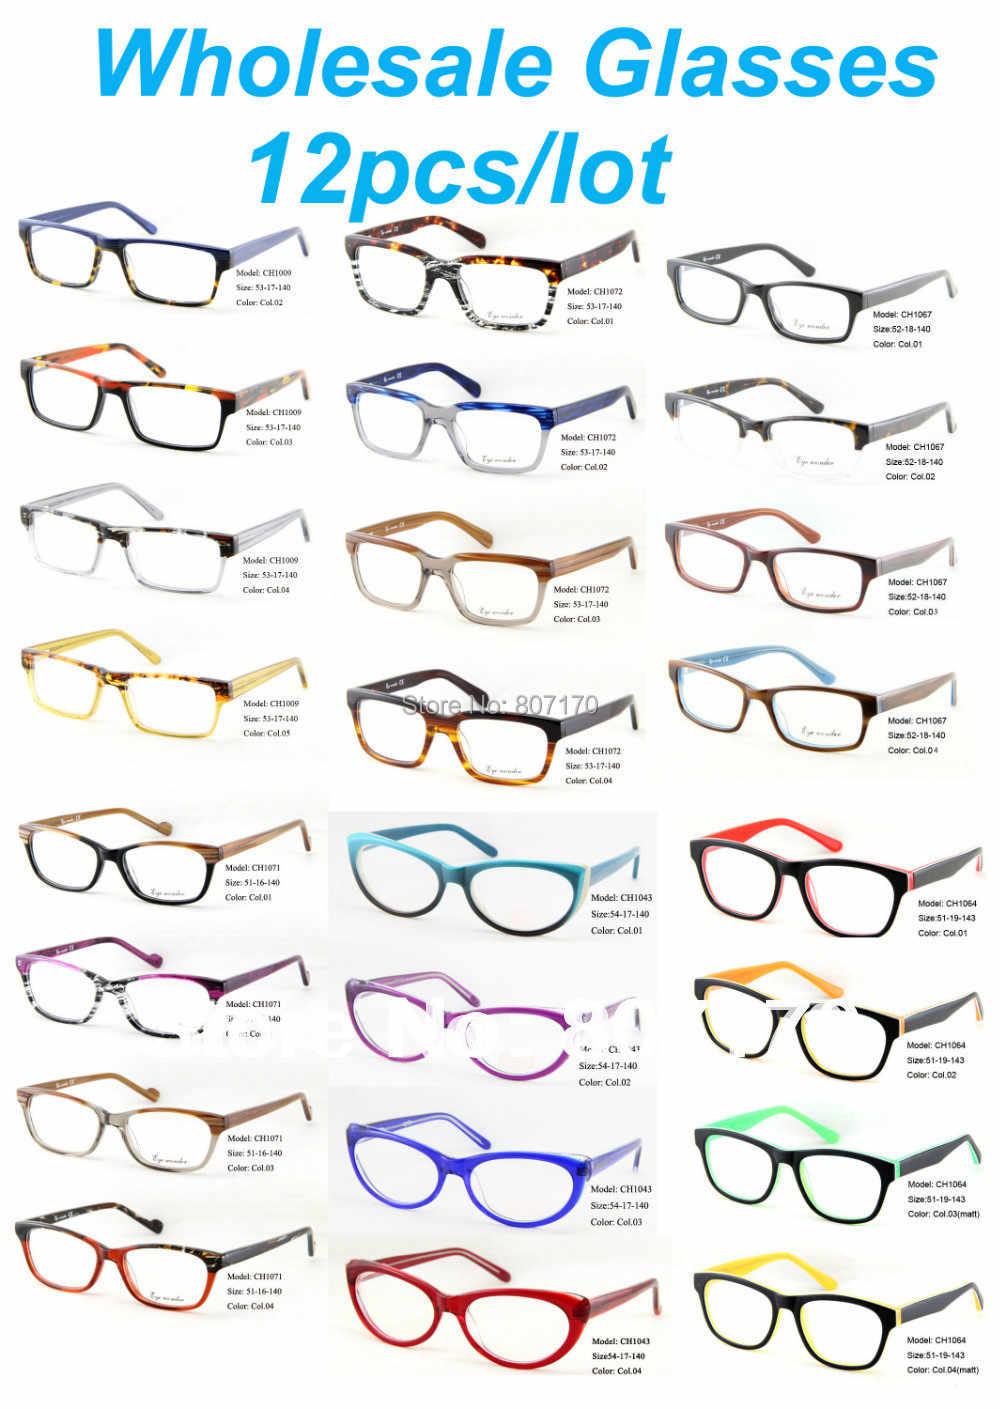 76a29a9a4b Detail Feedback Questions about Wholesale Eyewear Accessories Men Eyes  Vintage Glasses Frames Women Retro Optical Frame Eyeglass Oculos de grau  Cat Eye ...